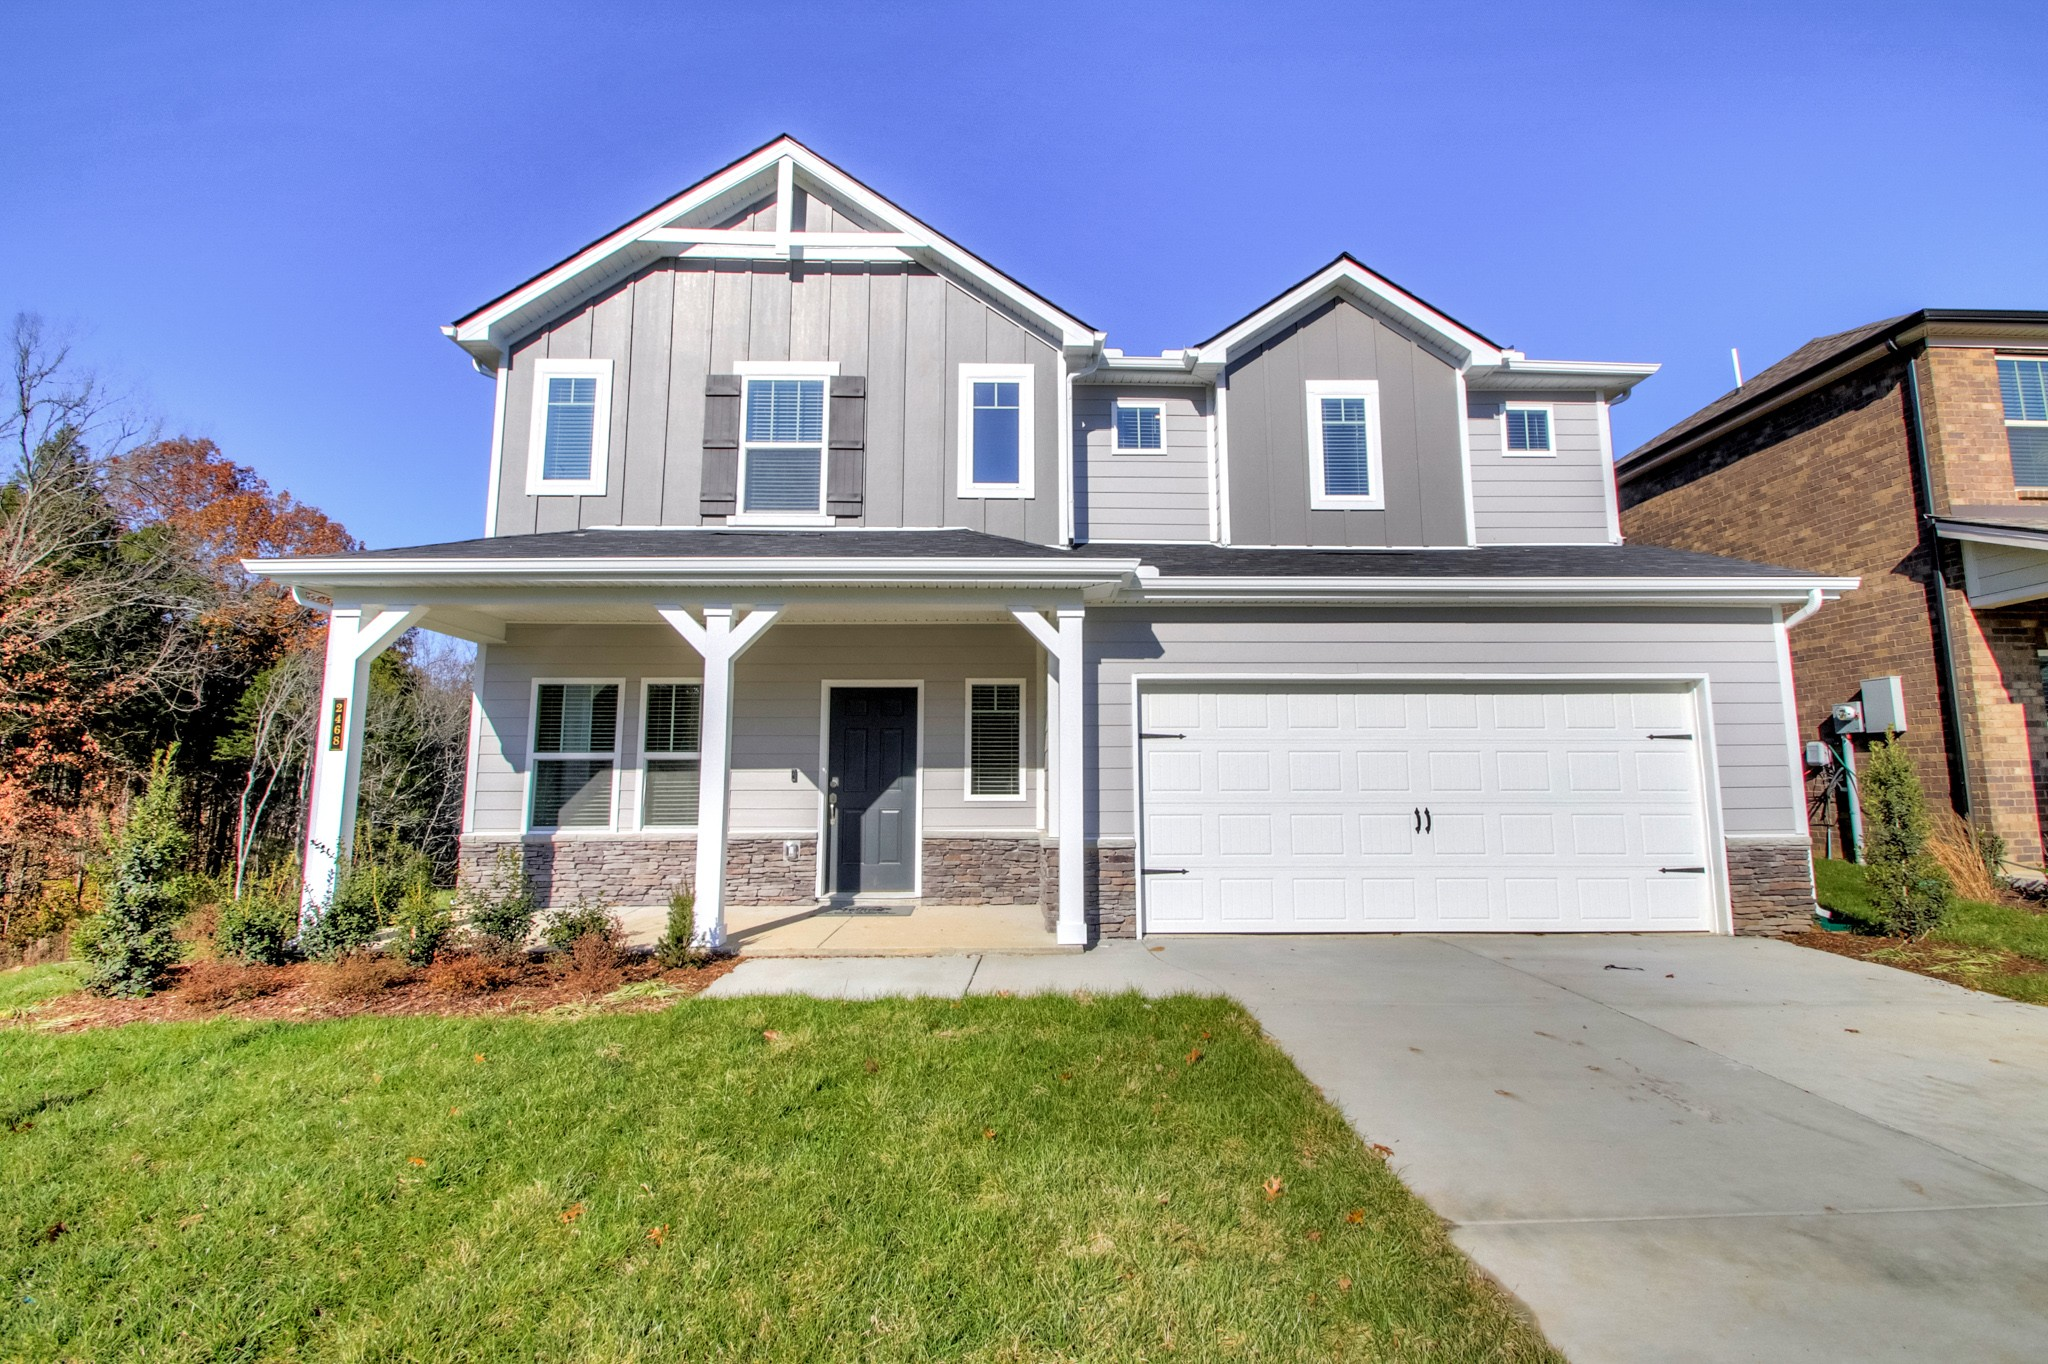 2468 Prairie Hill Dr, Antioch, TN 37013 - Antioch, TN real estate listing